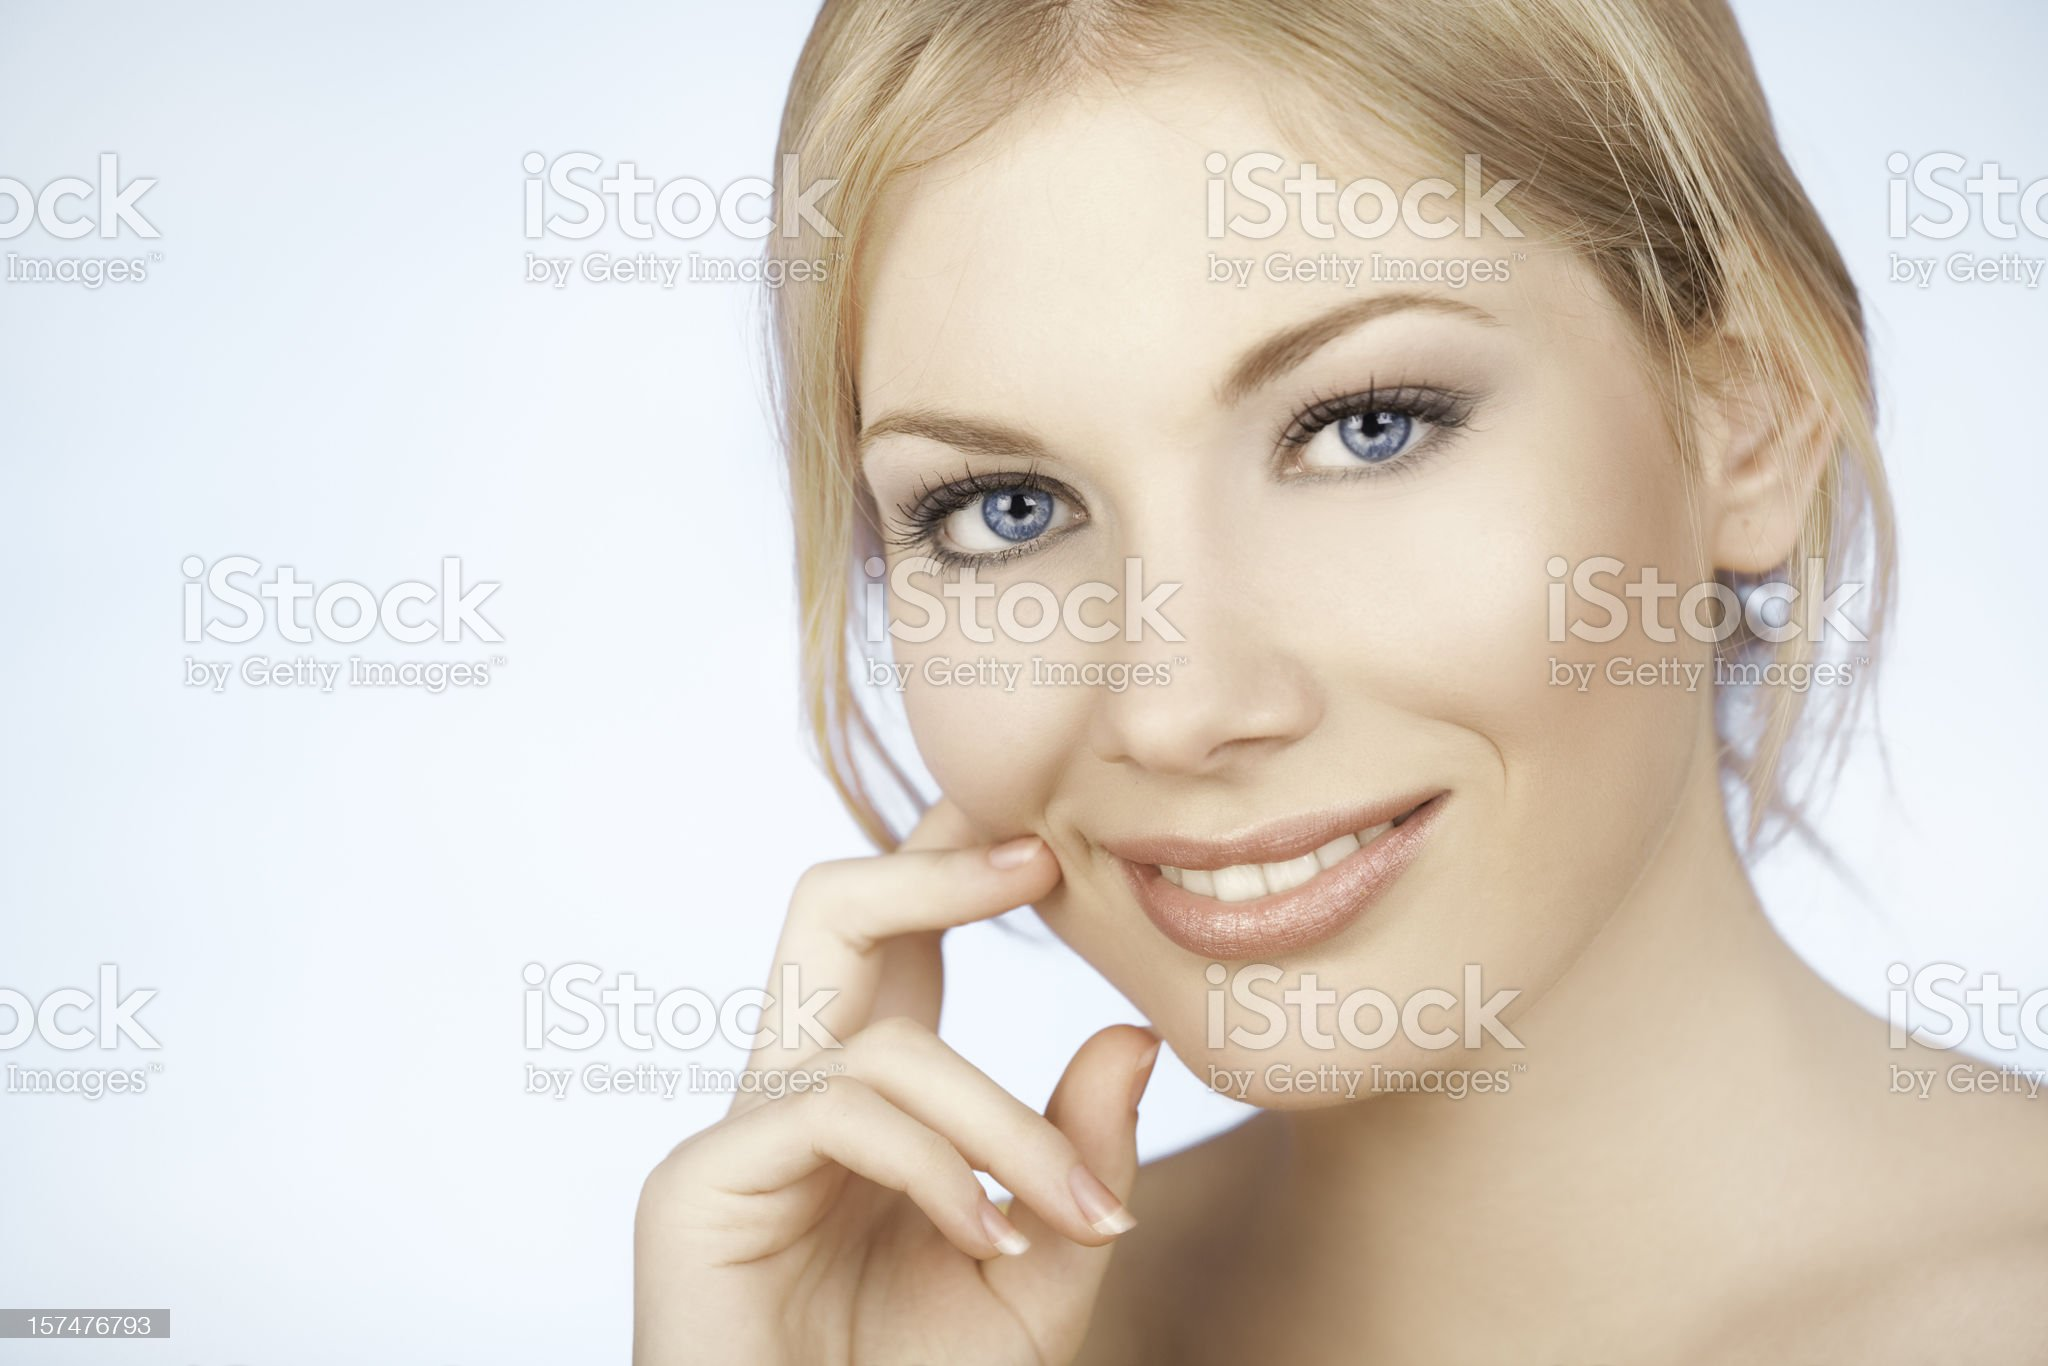 Smiling Beauty royalty-free stock photo